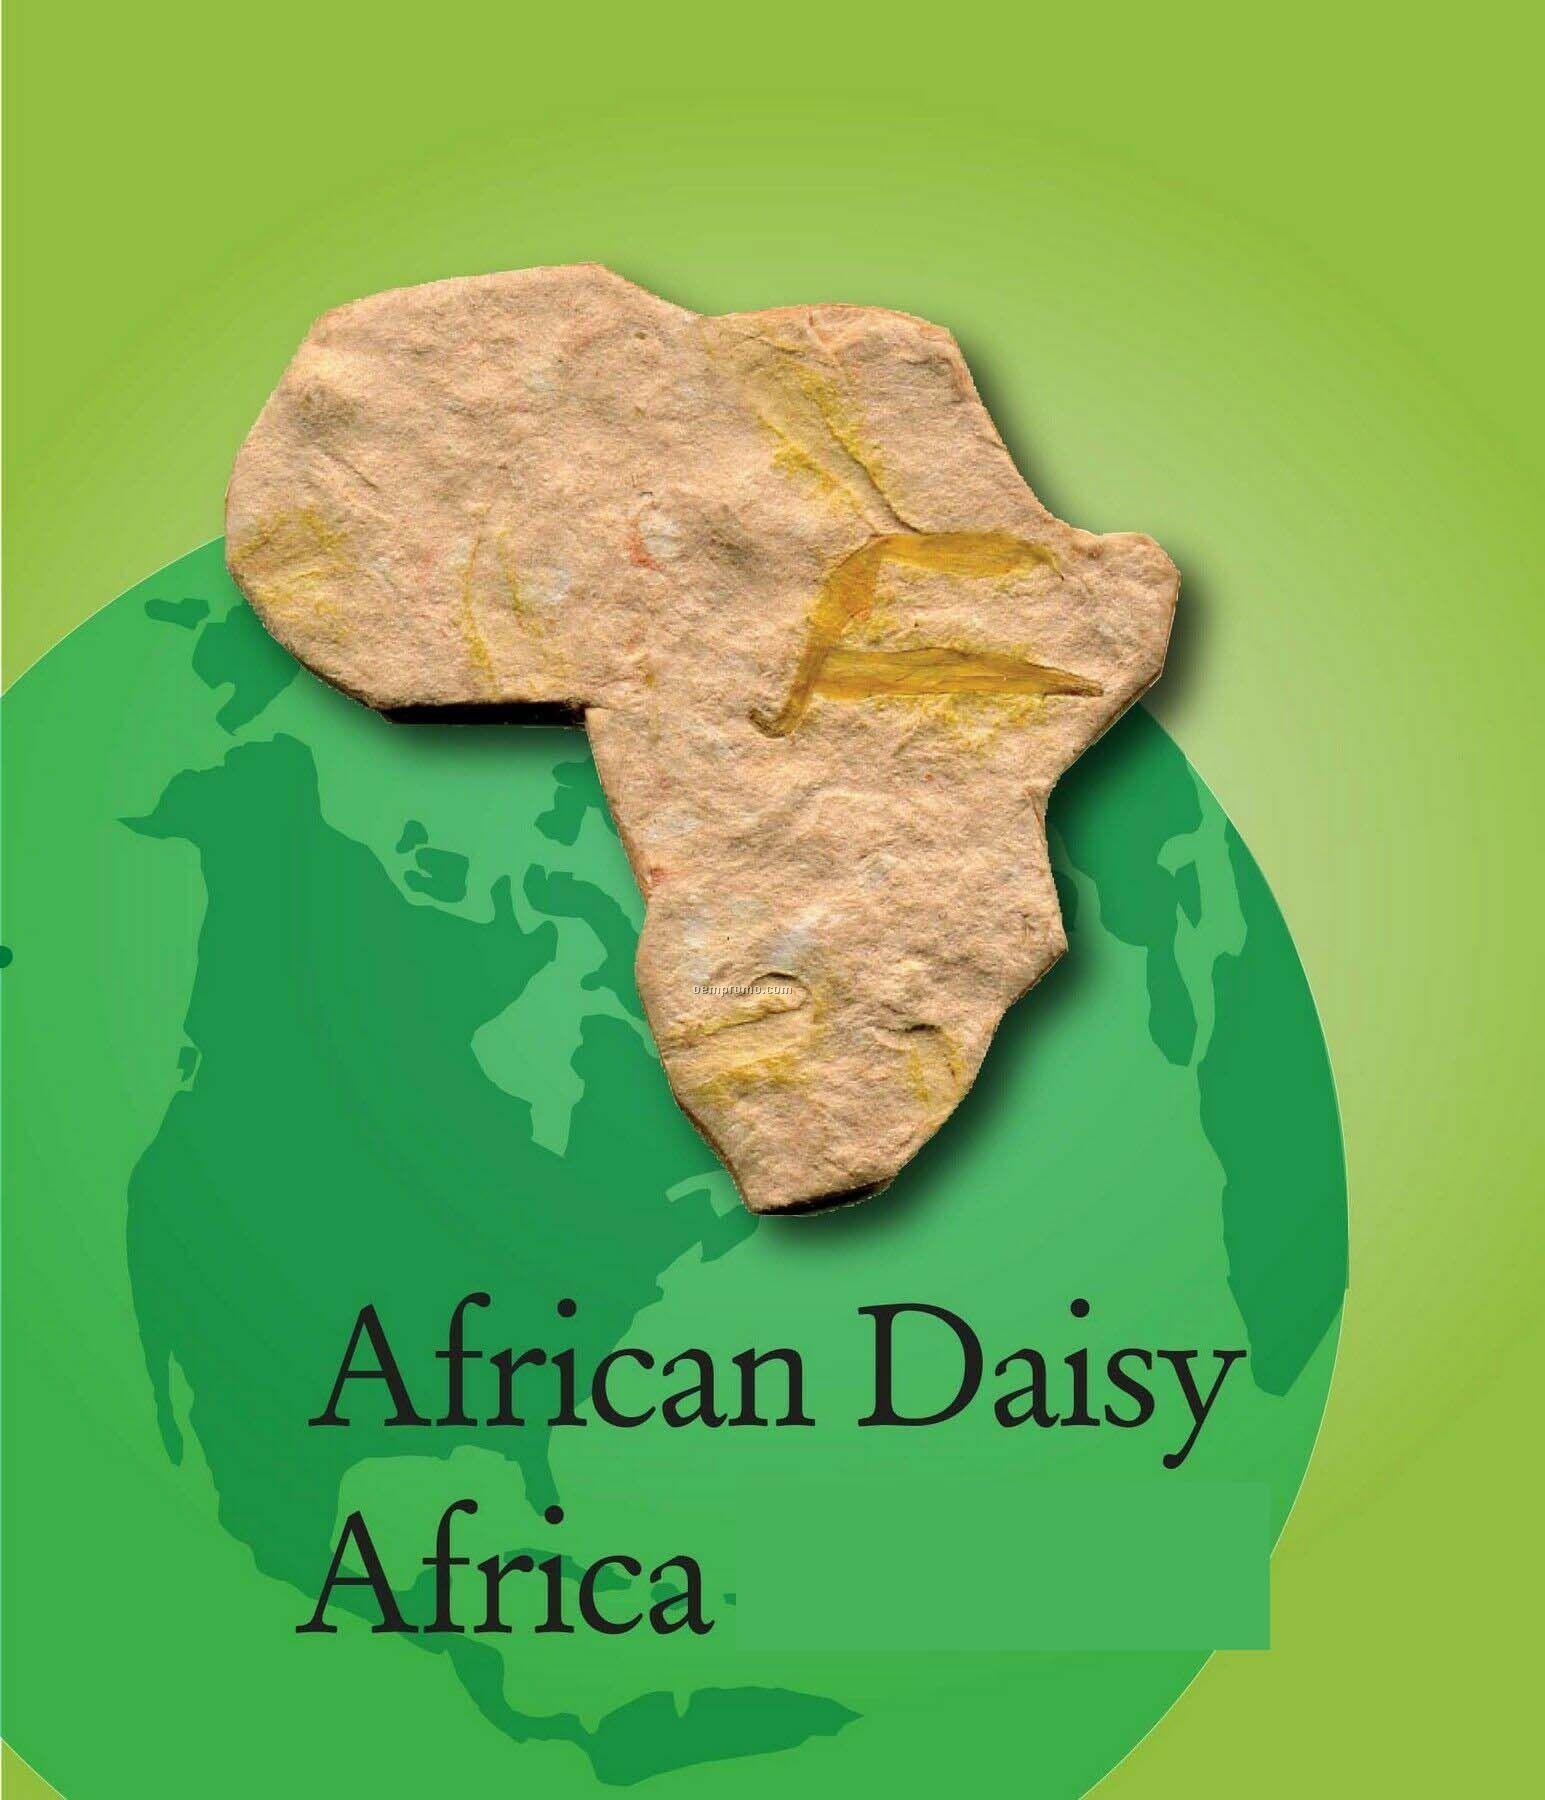 African Daisy Handmade Seed Plantable Mini